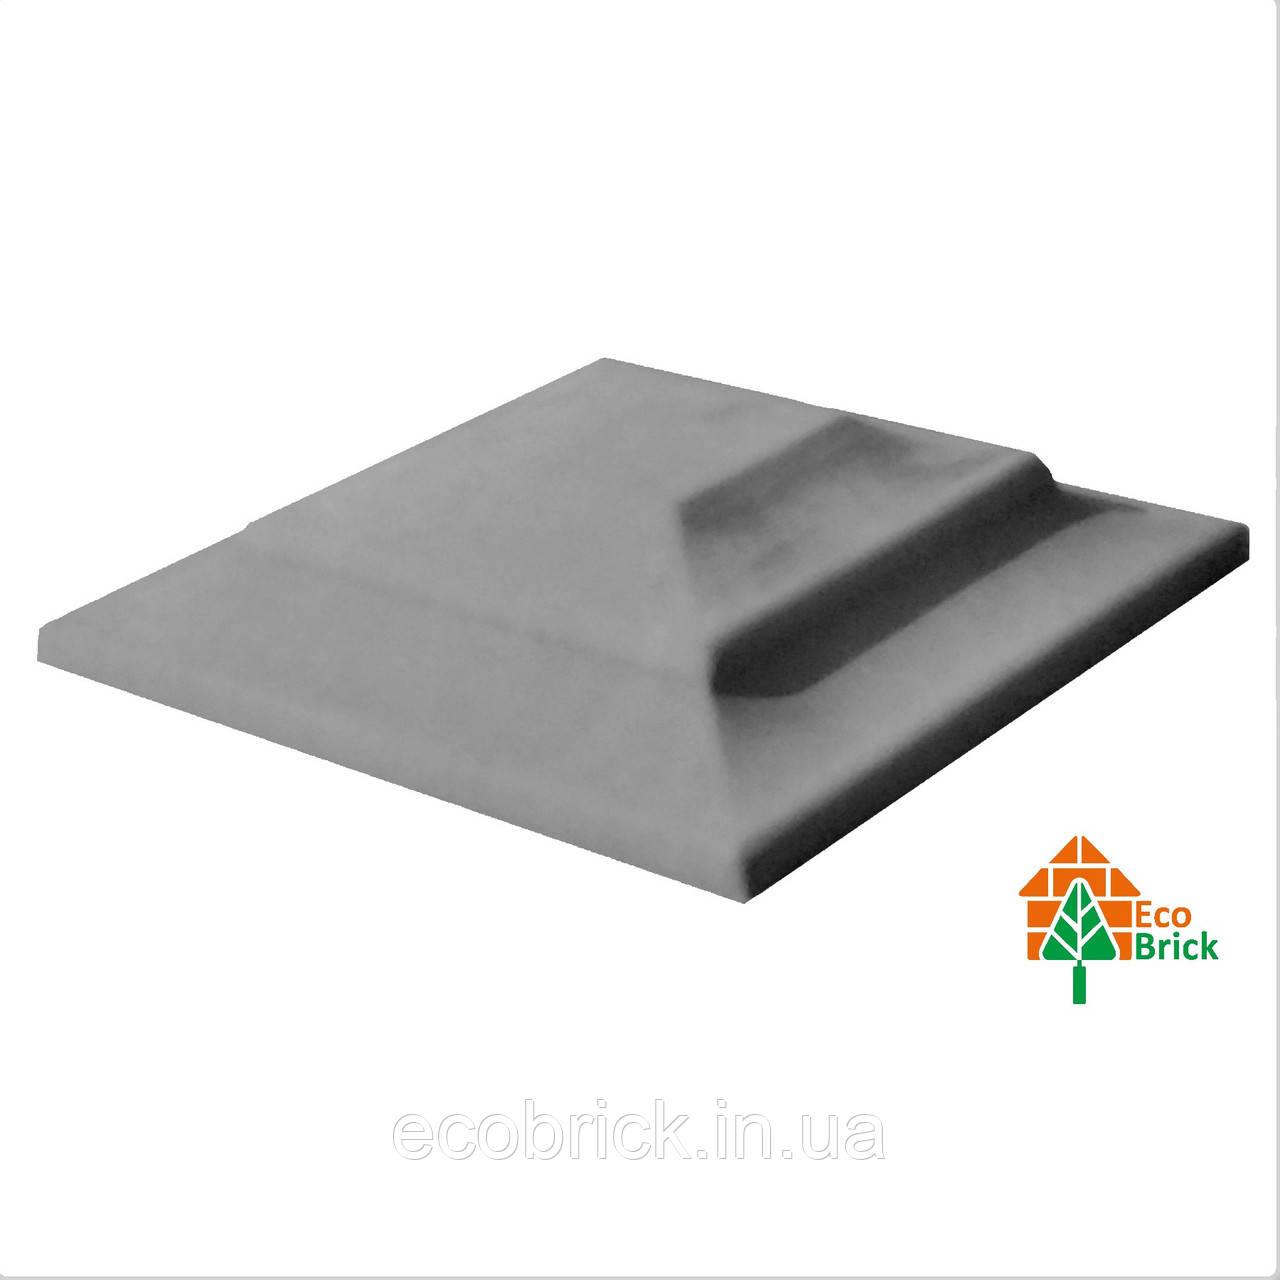 Крышка для кирпичного забора «КАРПАТИ» 310х310, цвет серый, вес 15 кг.